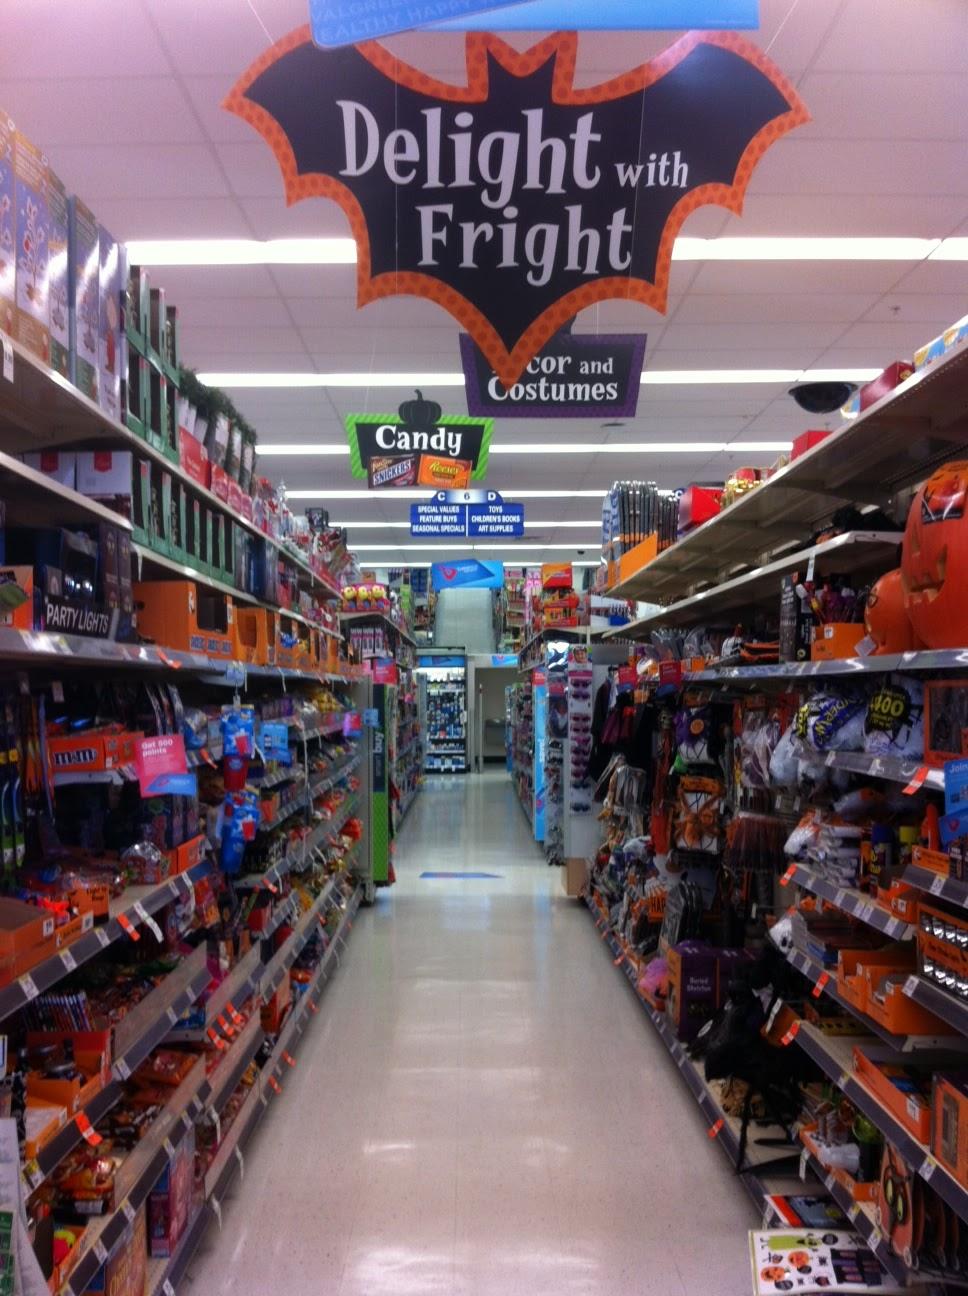 halloween shopping with walgreens balancerewards - Walgreens Halloween Decorations